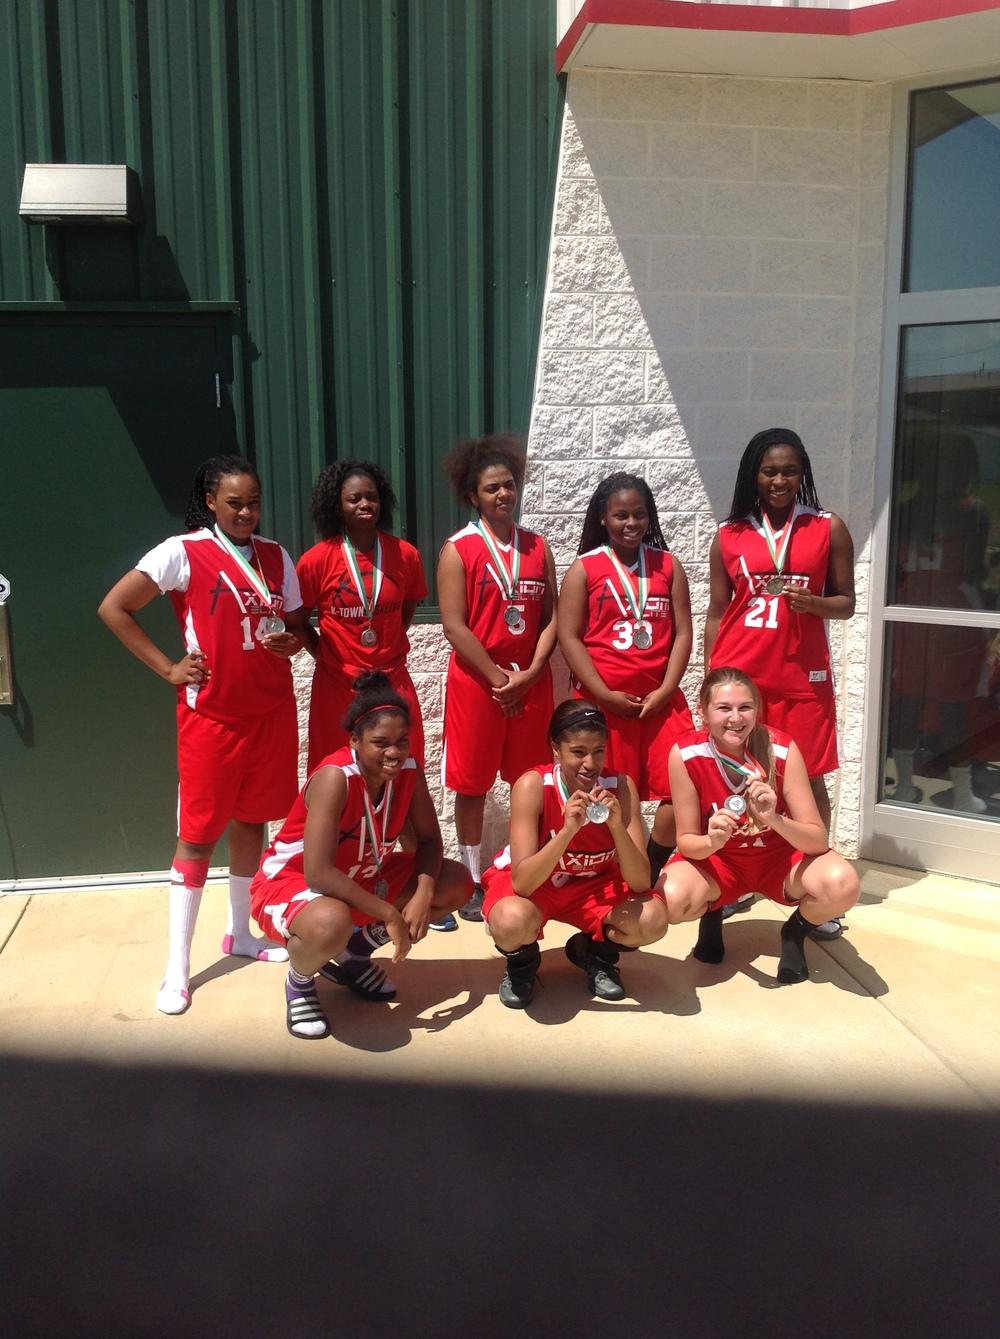 2014 17U Quad State Tournament Runner Up